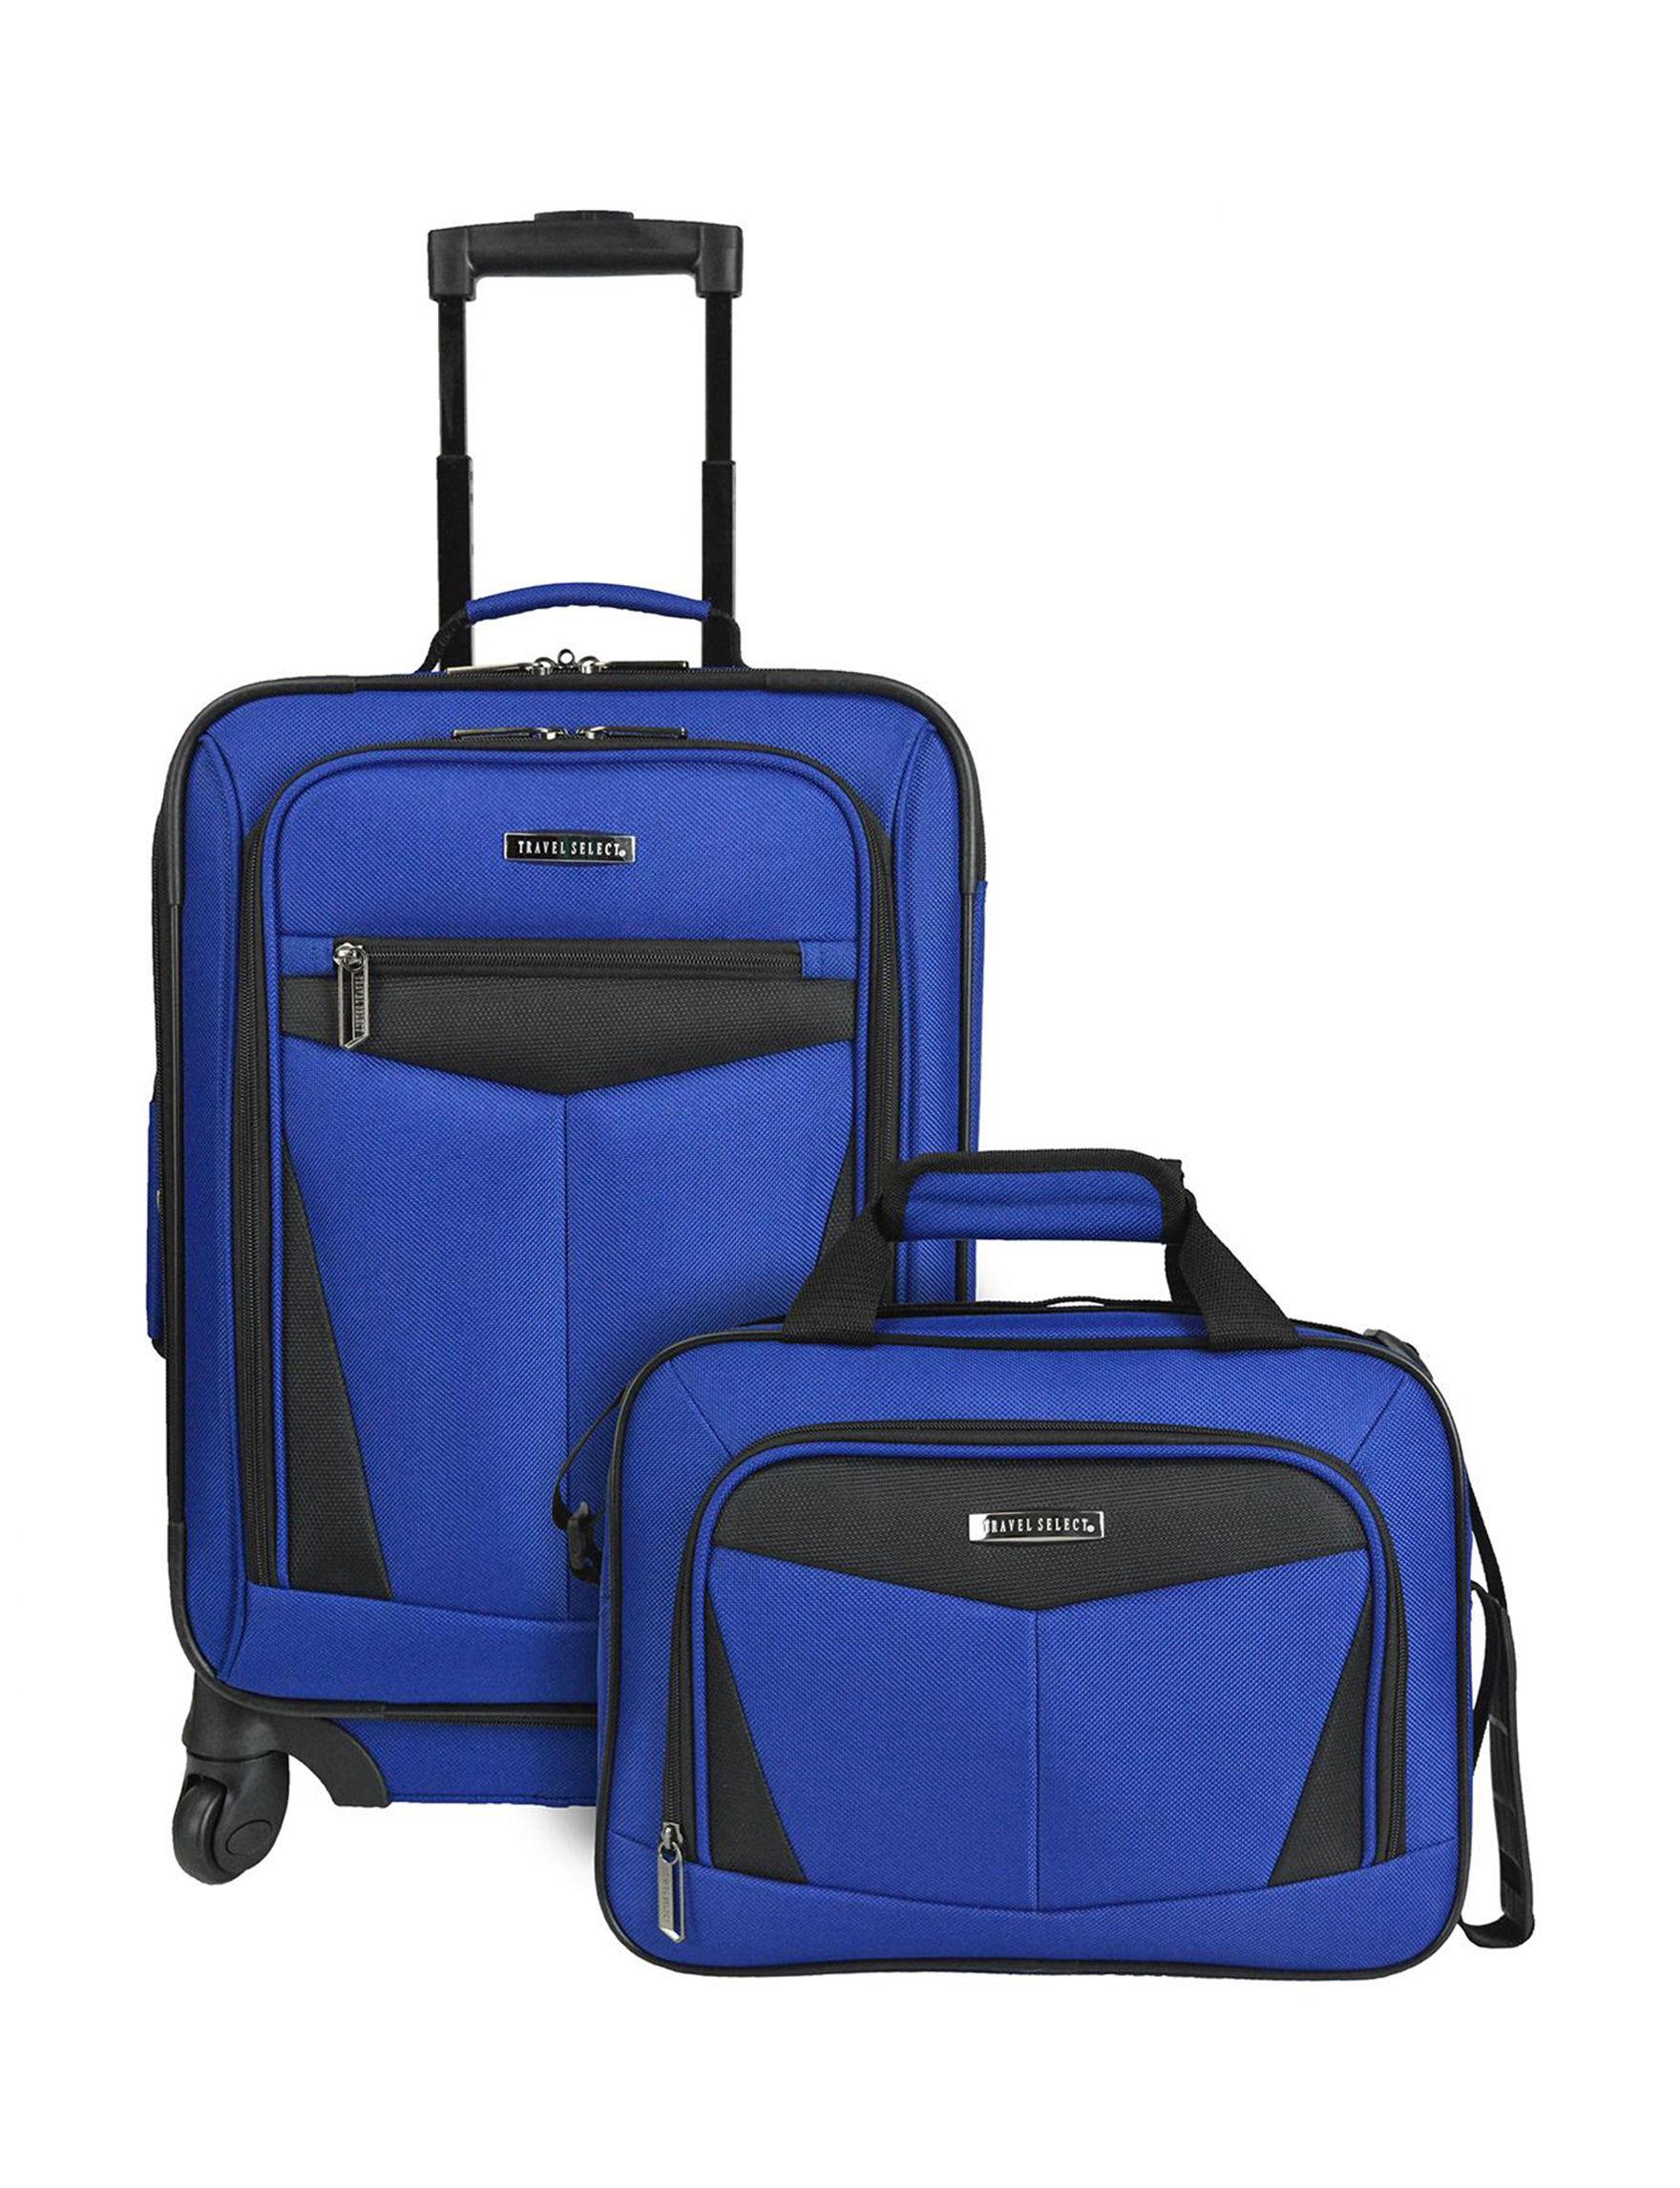 Travel Select Blue Luggage Sets